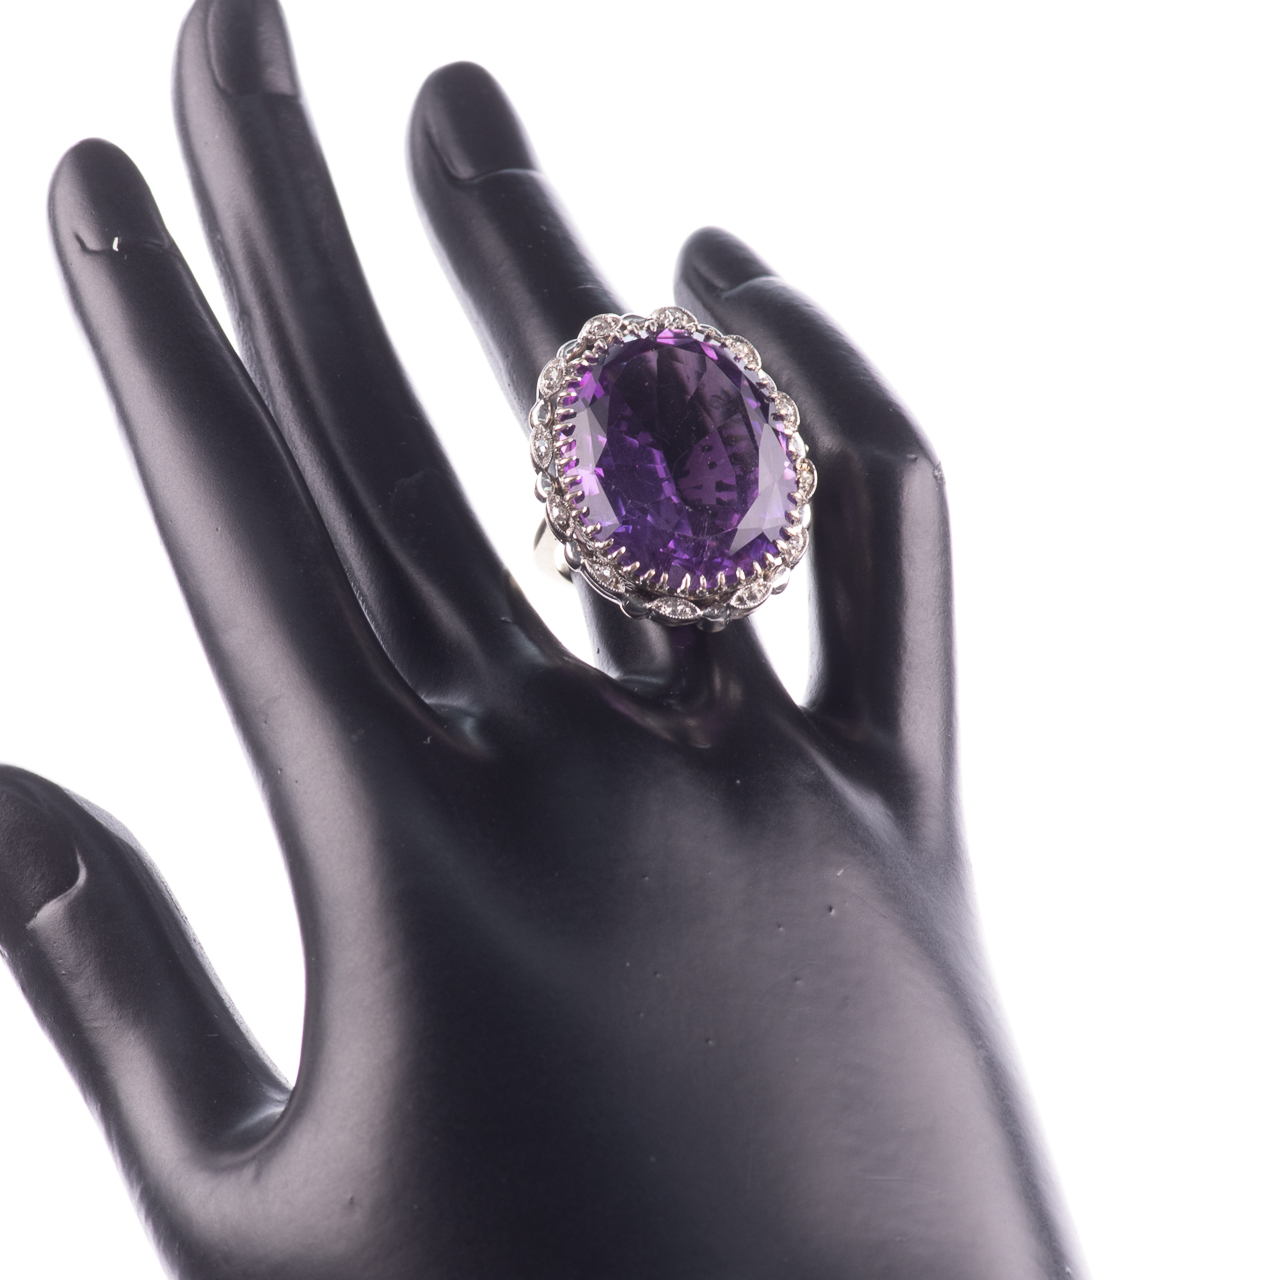 30ct Amethyst & Diamond Ring - Image 2 of 6